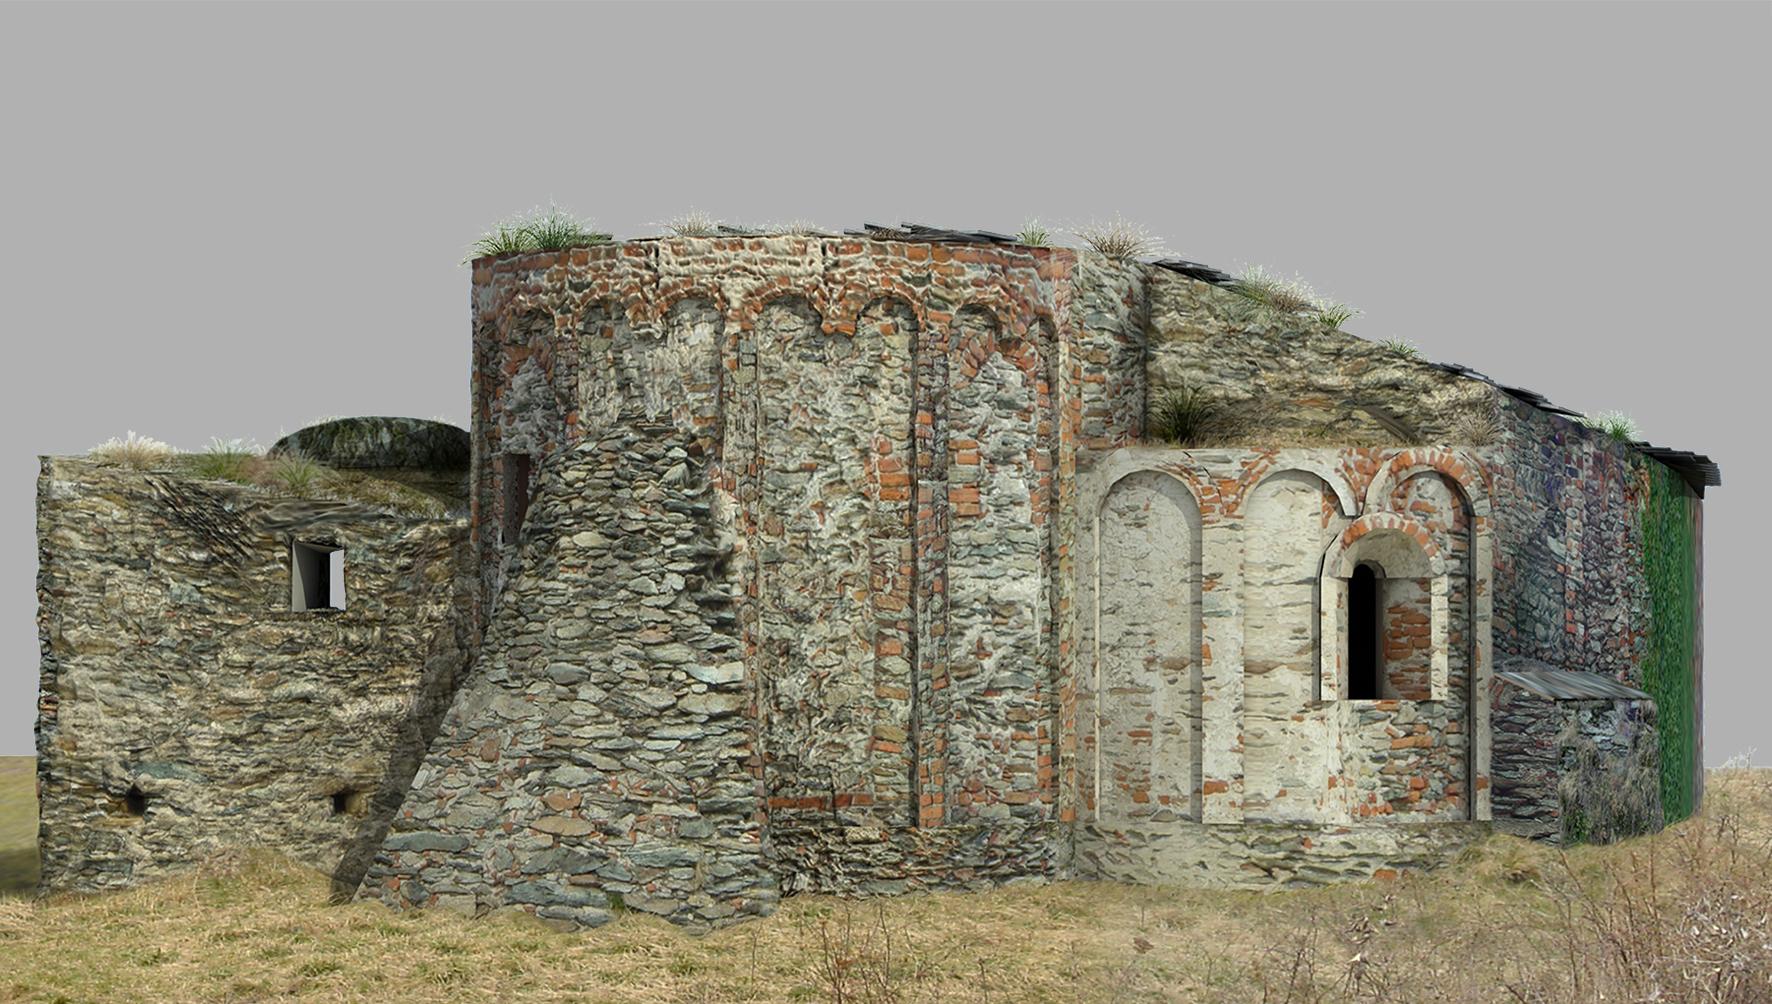 Tesi - ricostruzione storica